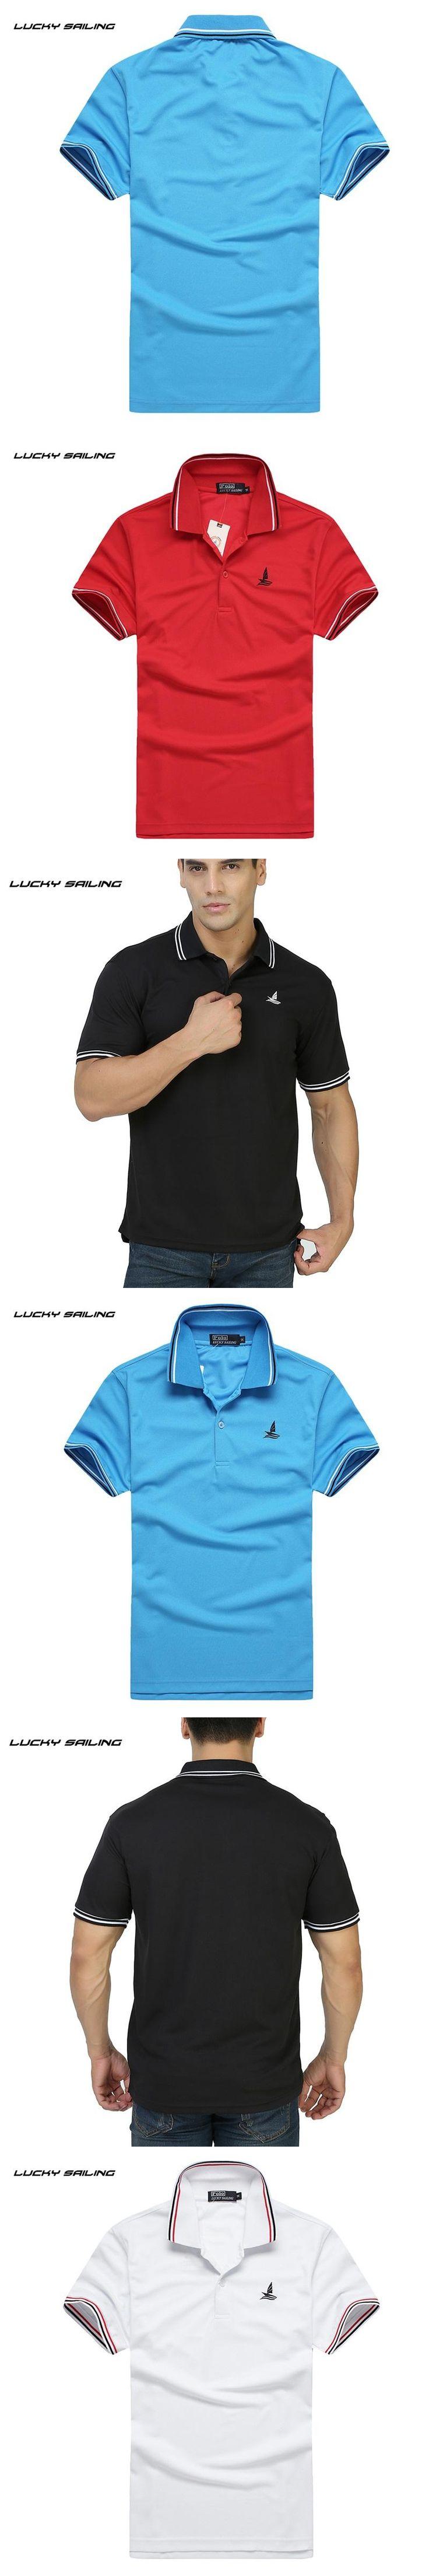 Striped Polo Shirt Men Casual Classic Summer Camisas Polos Short Sleeve Turn-down Collar Poloshirt Mens Tee Shirts Homme Fashion